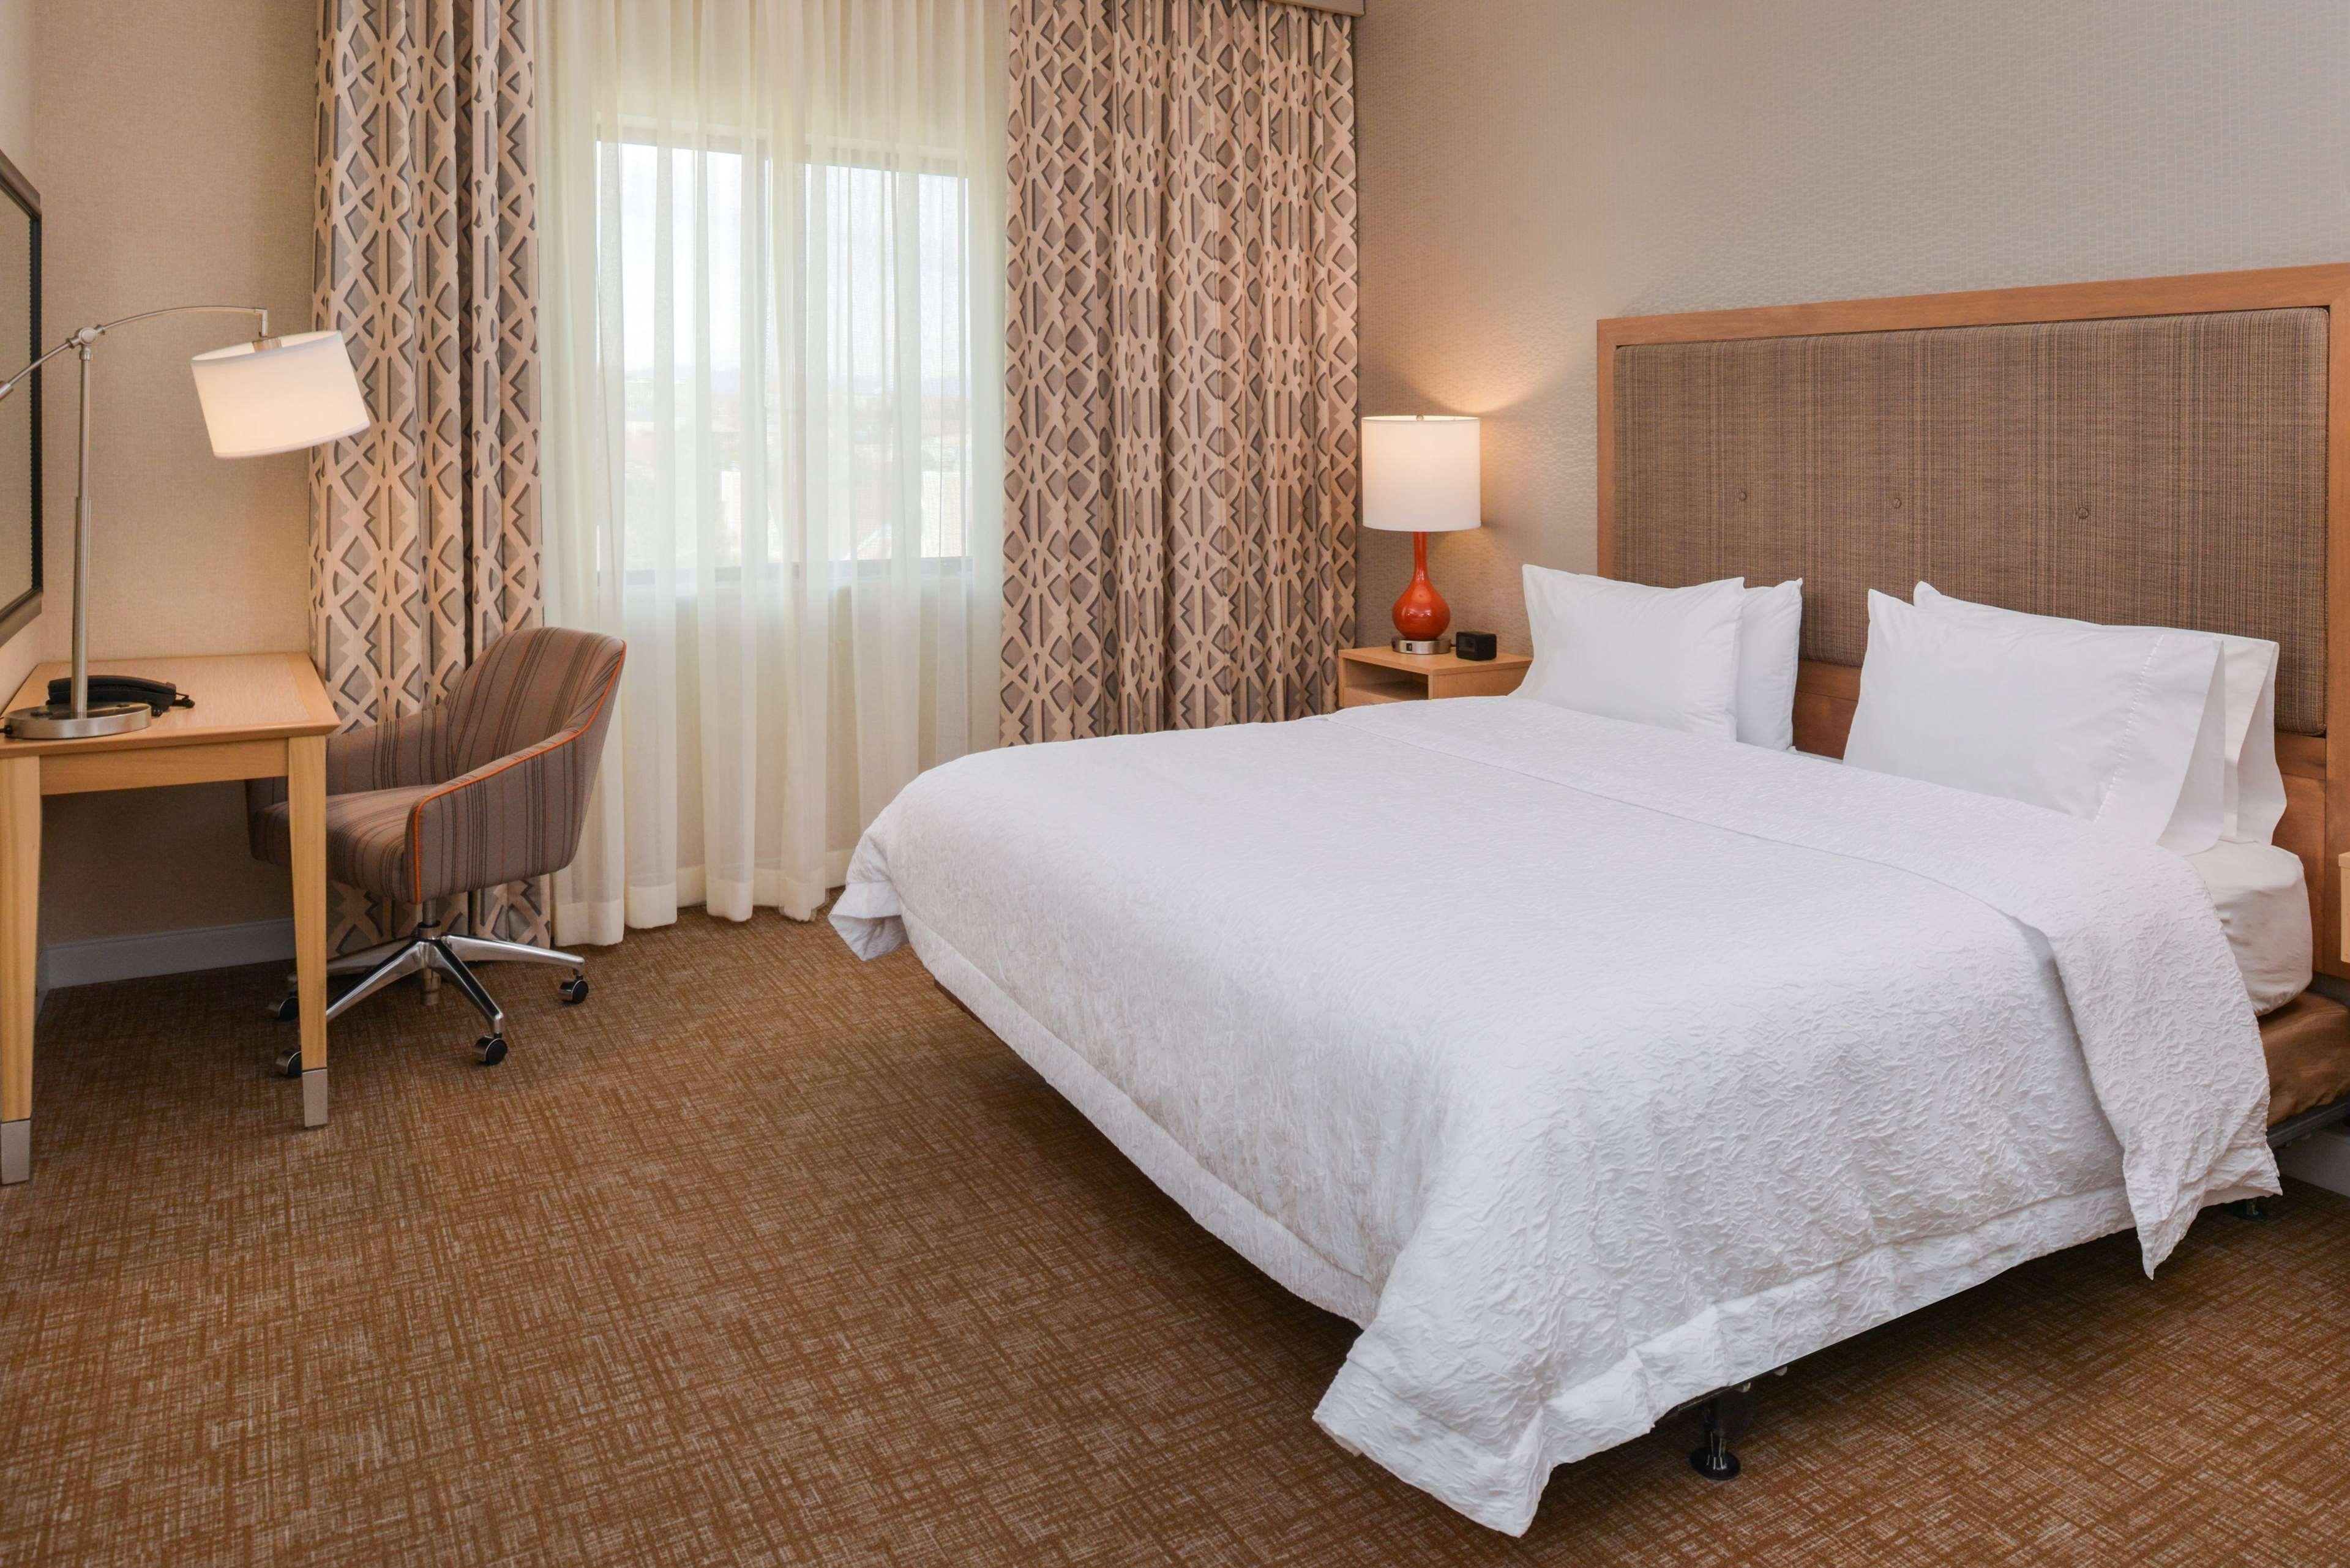 Hampton Inn & Suites Denver-Speer Boulevard image 46